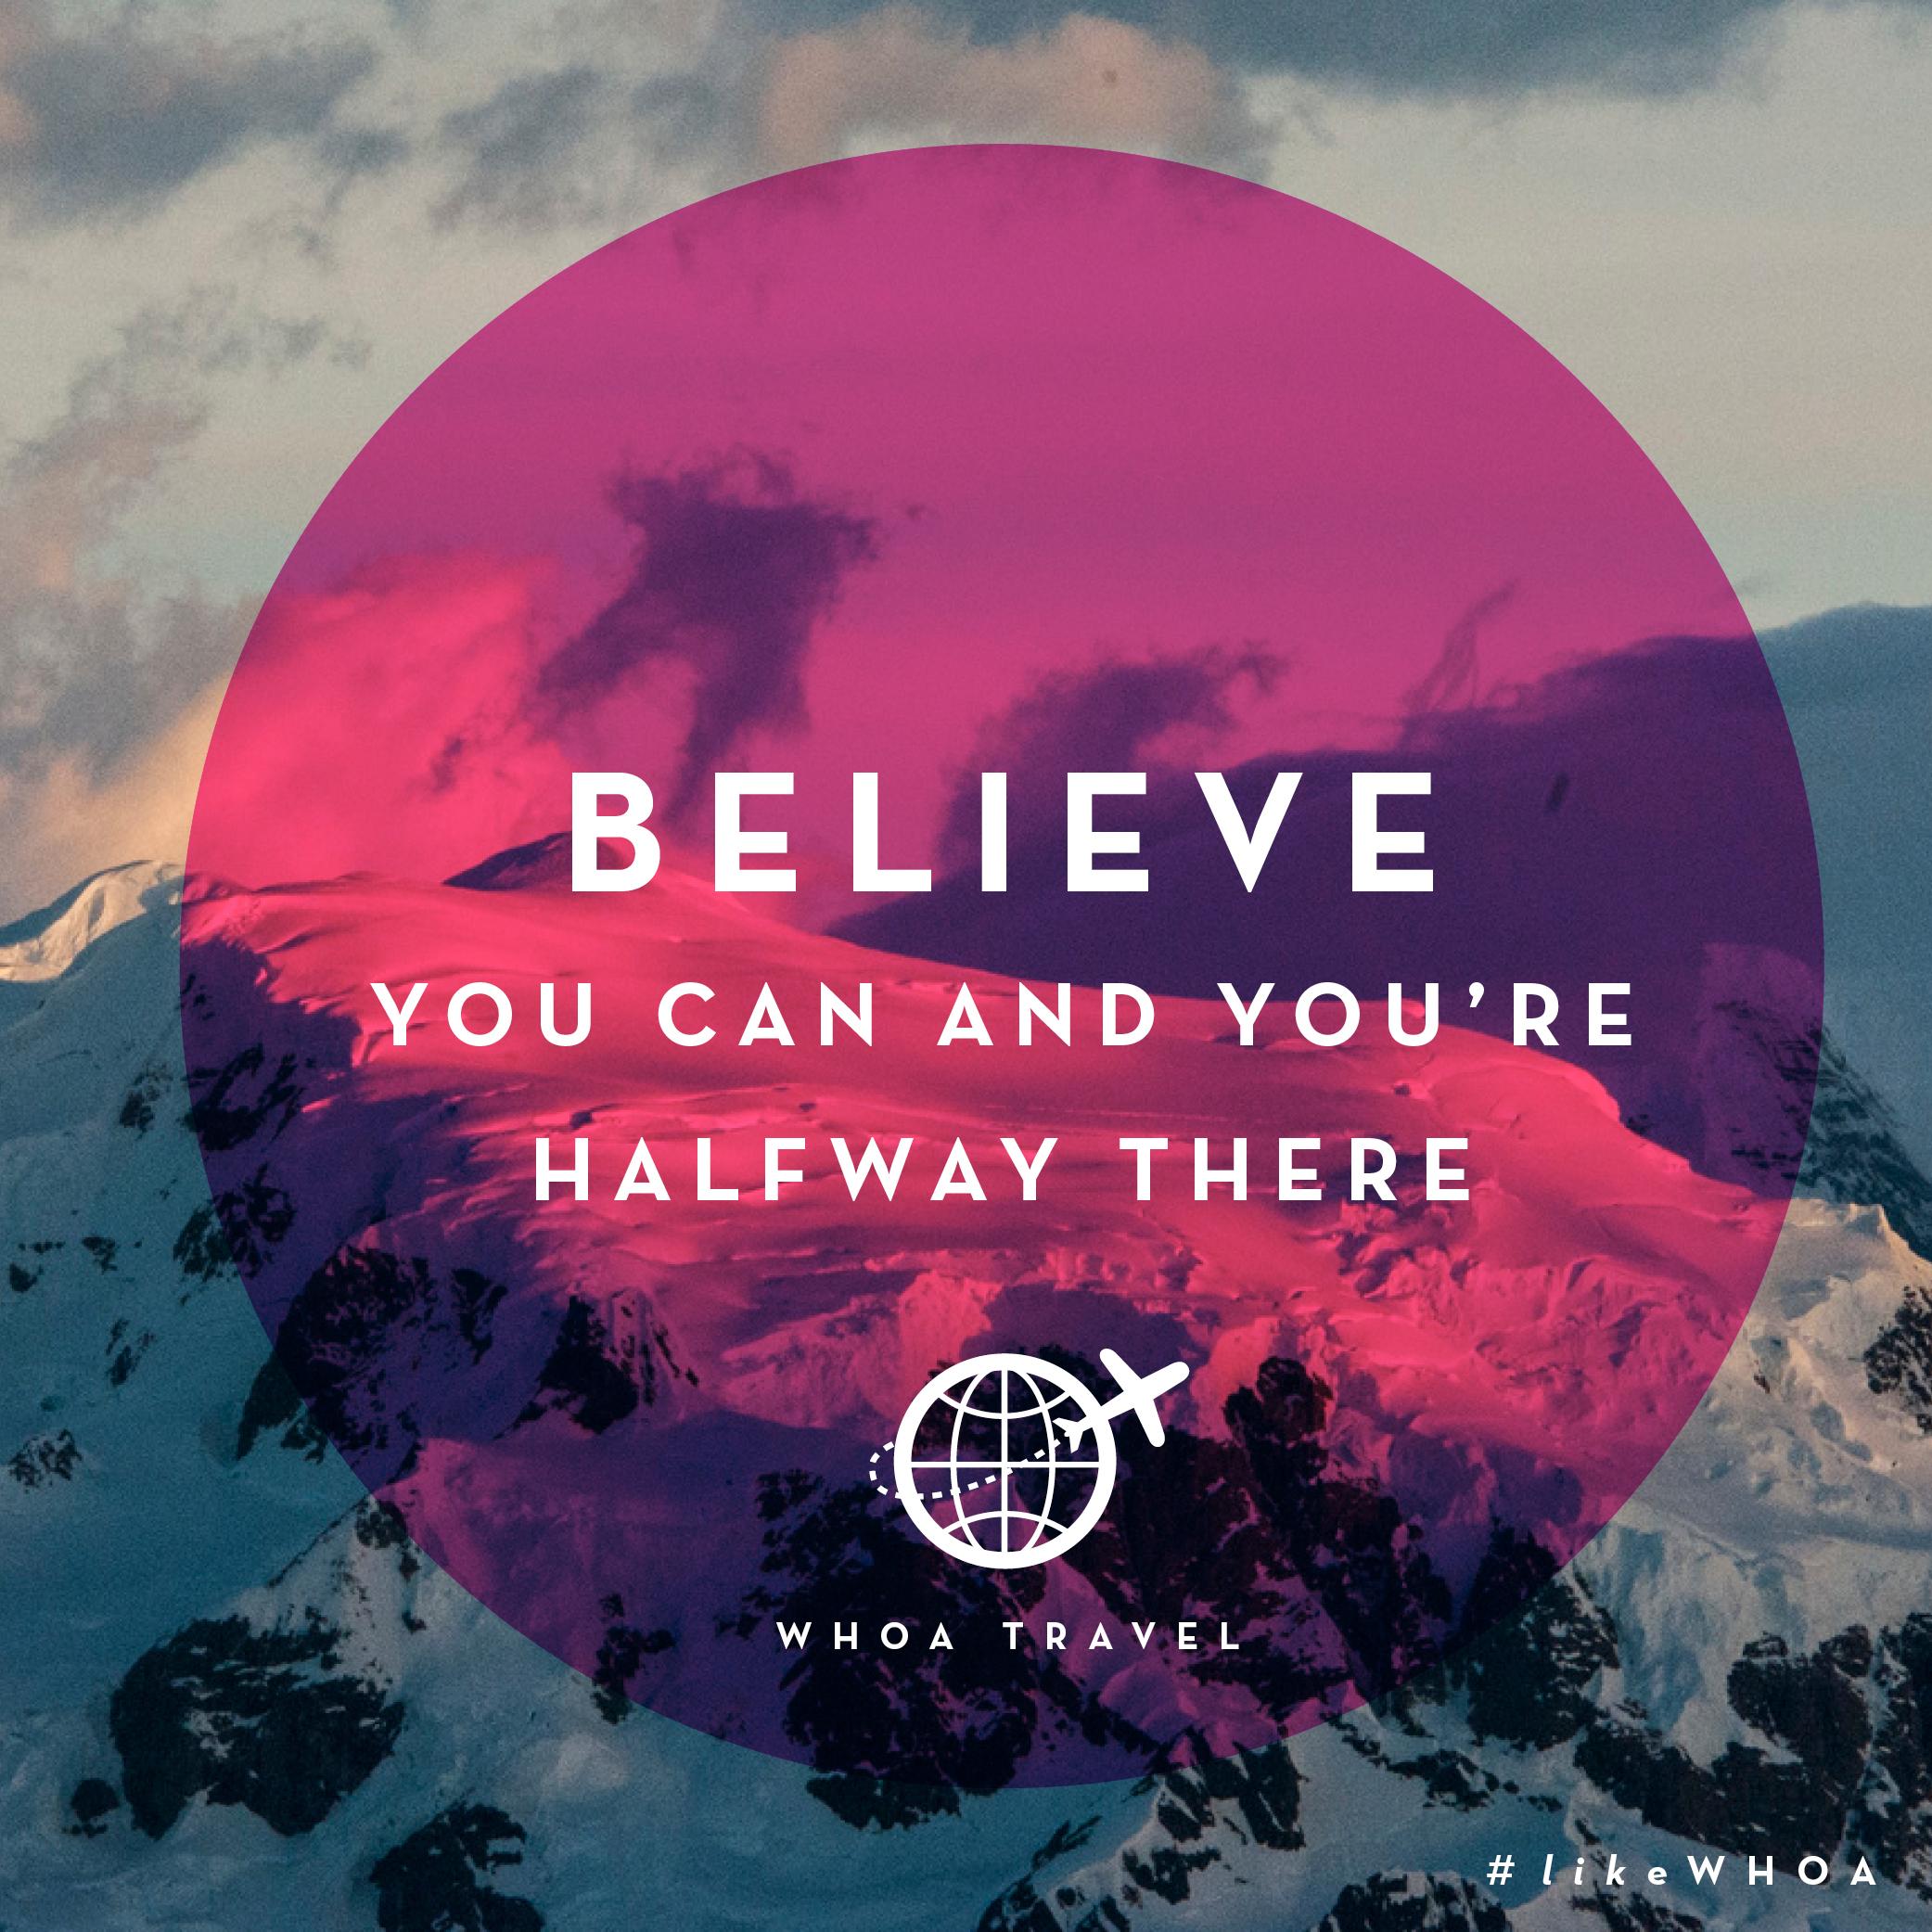 WHOA travel inspiration ADVENSPIRATION believe